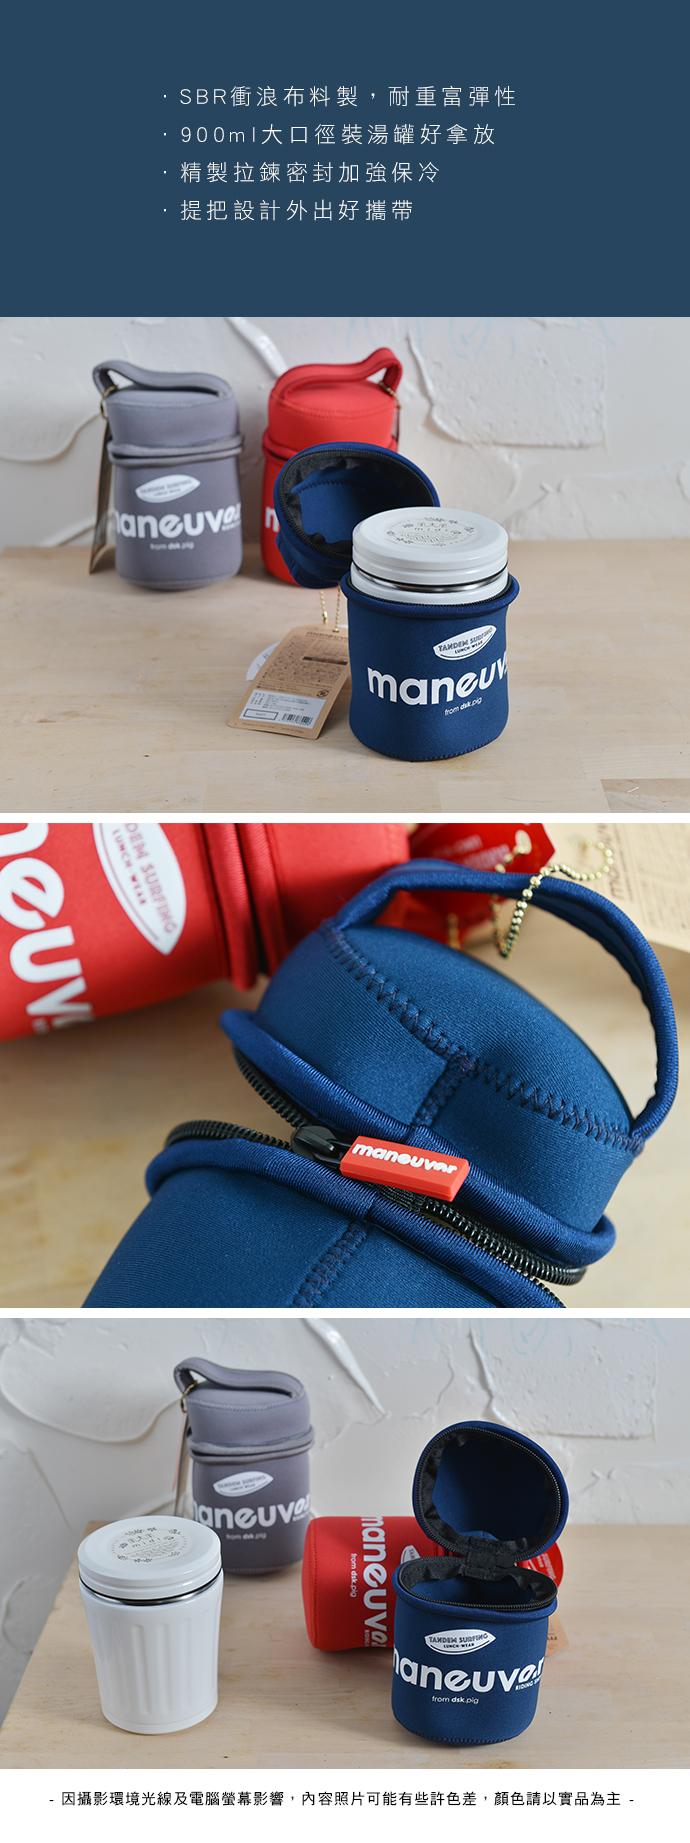 CB Japan|海洋系列保冷手提湯袋 - 海軍藍